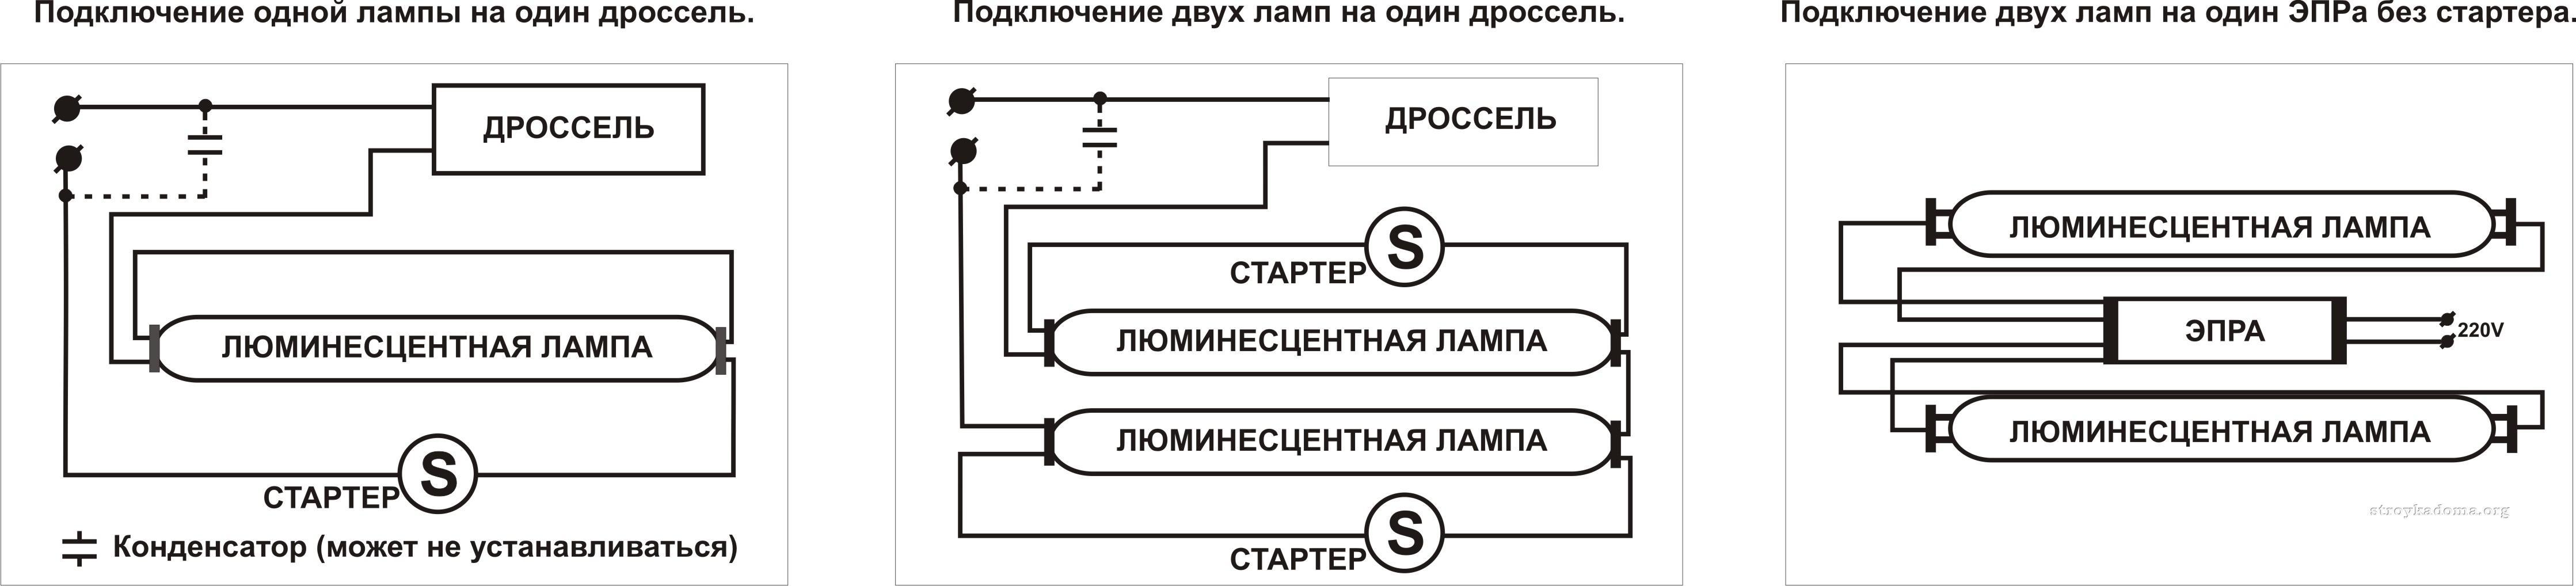 фото инструкция подключения ламп дневного света